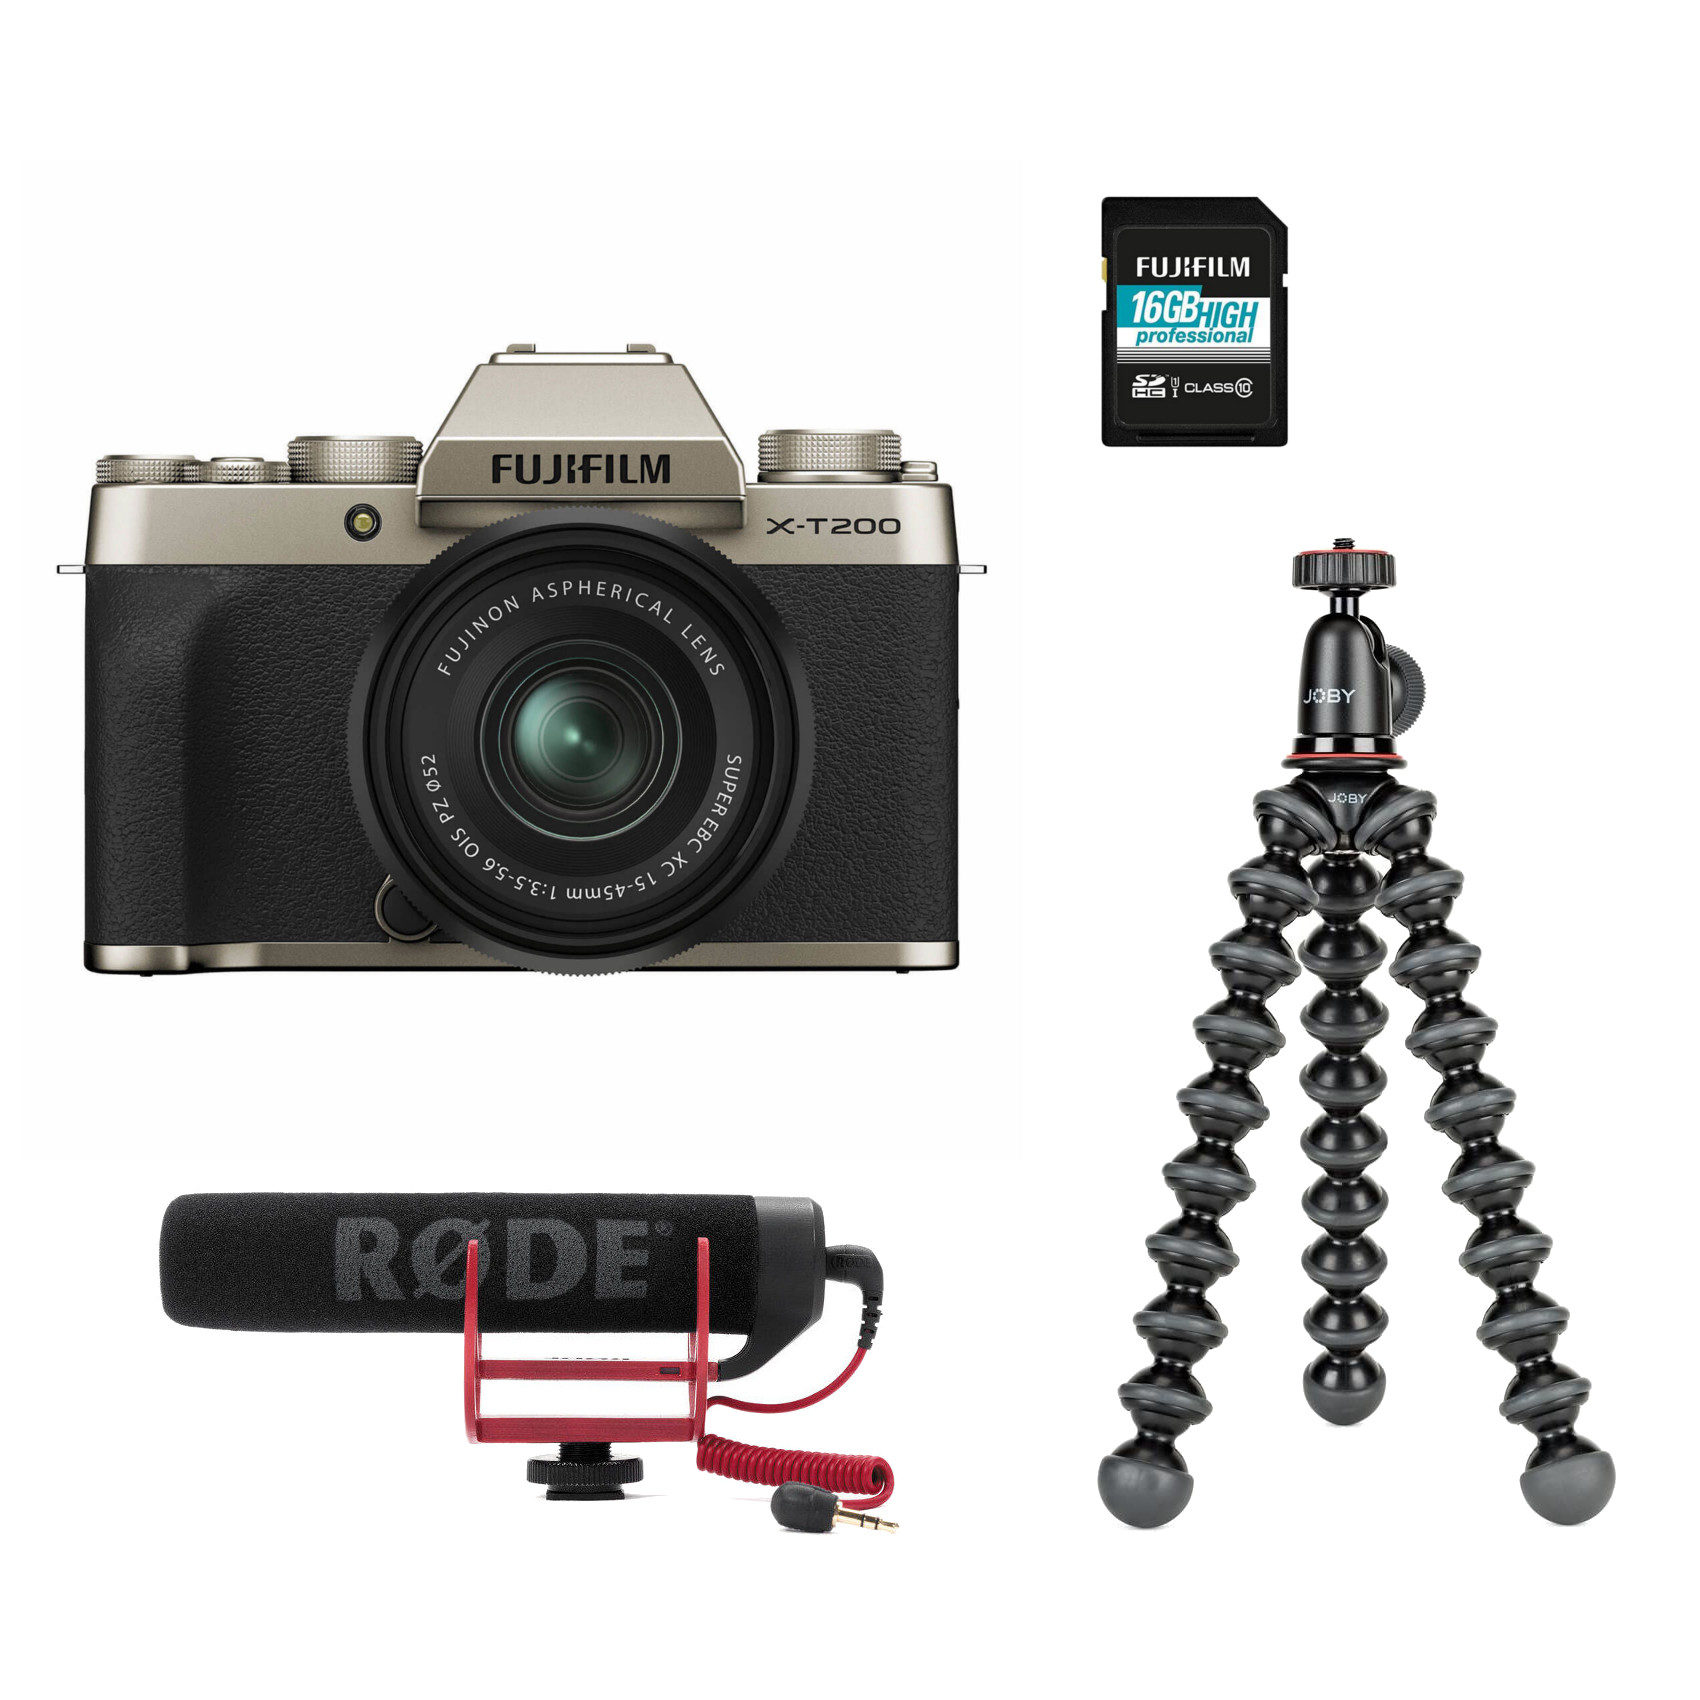 Fujifilm X-T200 systeemcamera Champagne Goud + XC 15-45mm Vlogger Kit <br/>€ 899.00 <br/> <a href='https://www.cameranu.nl/fotografie/?tt=12190_474631_241358_&r=https%3A%2F%2Fwww.cameranu.nl%2Fnl%2Fp3174082%2Ffujifilm-x-t200-systeemcamera-champagne-goud-xc-15-45mm-vlogger-kit%3Fchannable%3De10841.MzE3NDA4Mg%26utm_campaign%3D%26utm_content%3DSysteemcamera%26utm_source%3DTradetracker%26utm_medium%3Dcpc%26utm_term%3DDigitale%2Bcamera%26apos%3Bs' target='_blank'>naar de winkel</a>